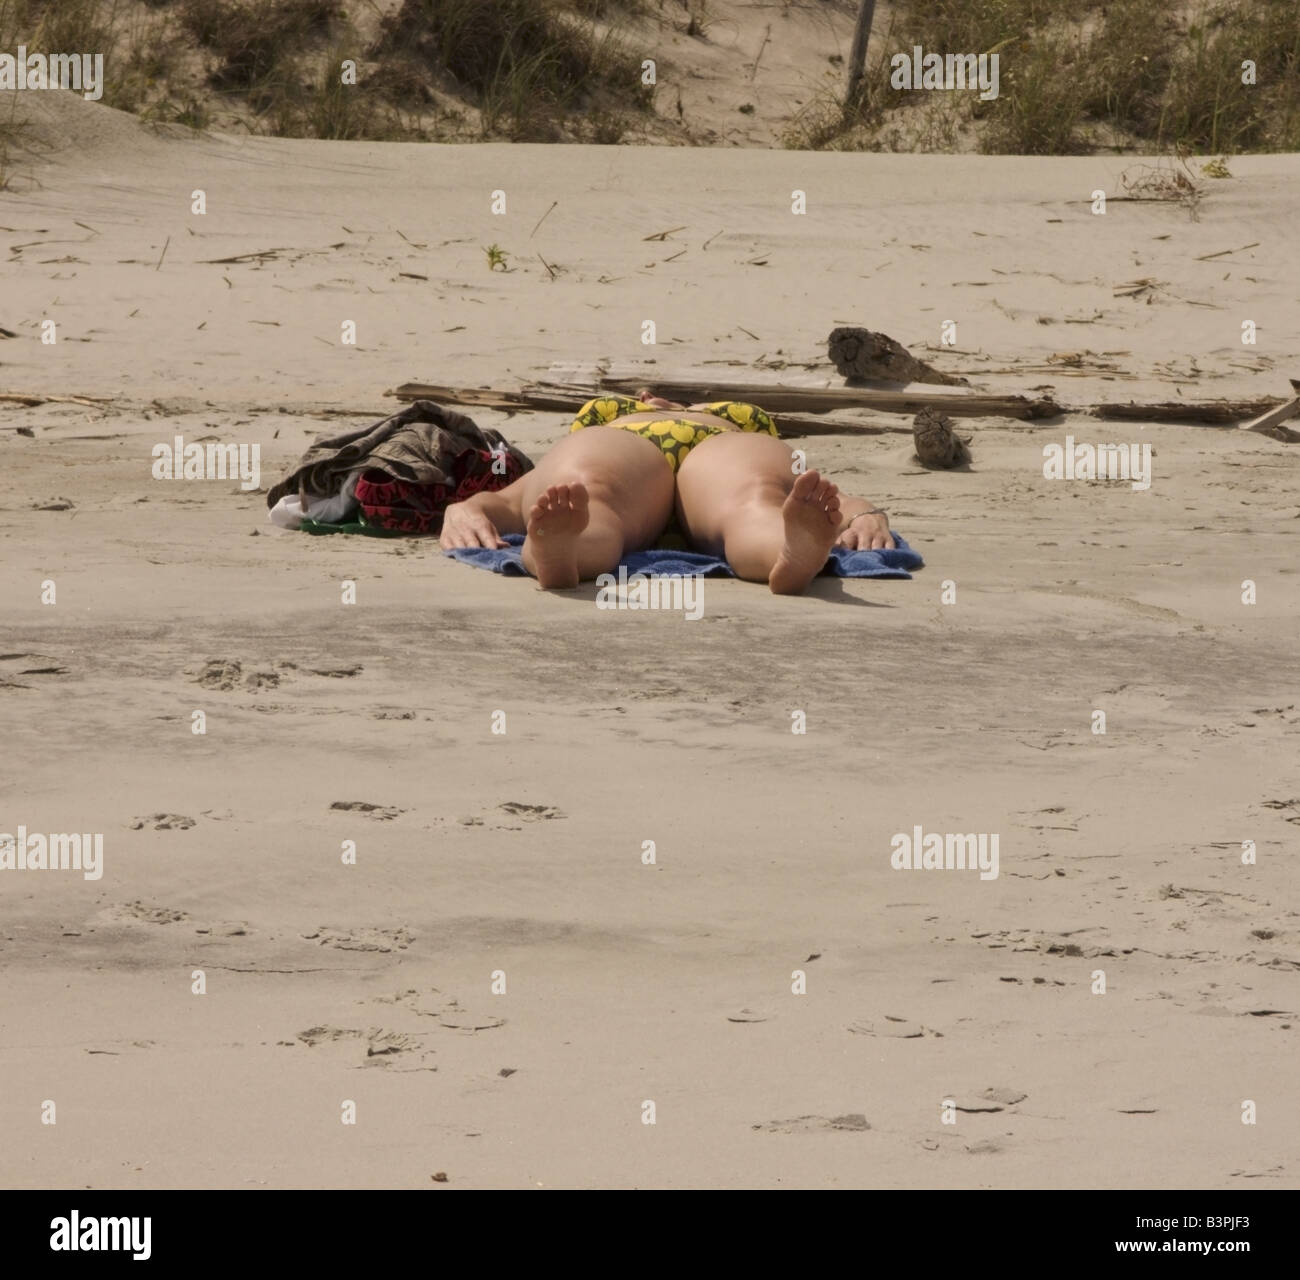 An obese sunbather lies on a beach near Myrtle Beach, South Carolina. - Stock Image